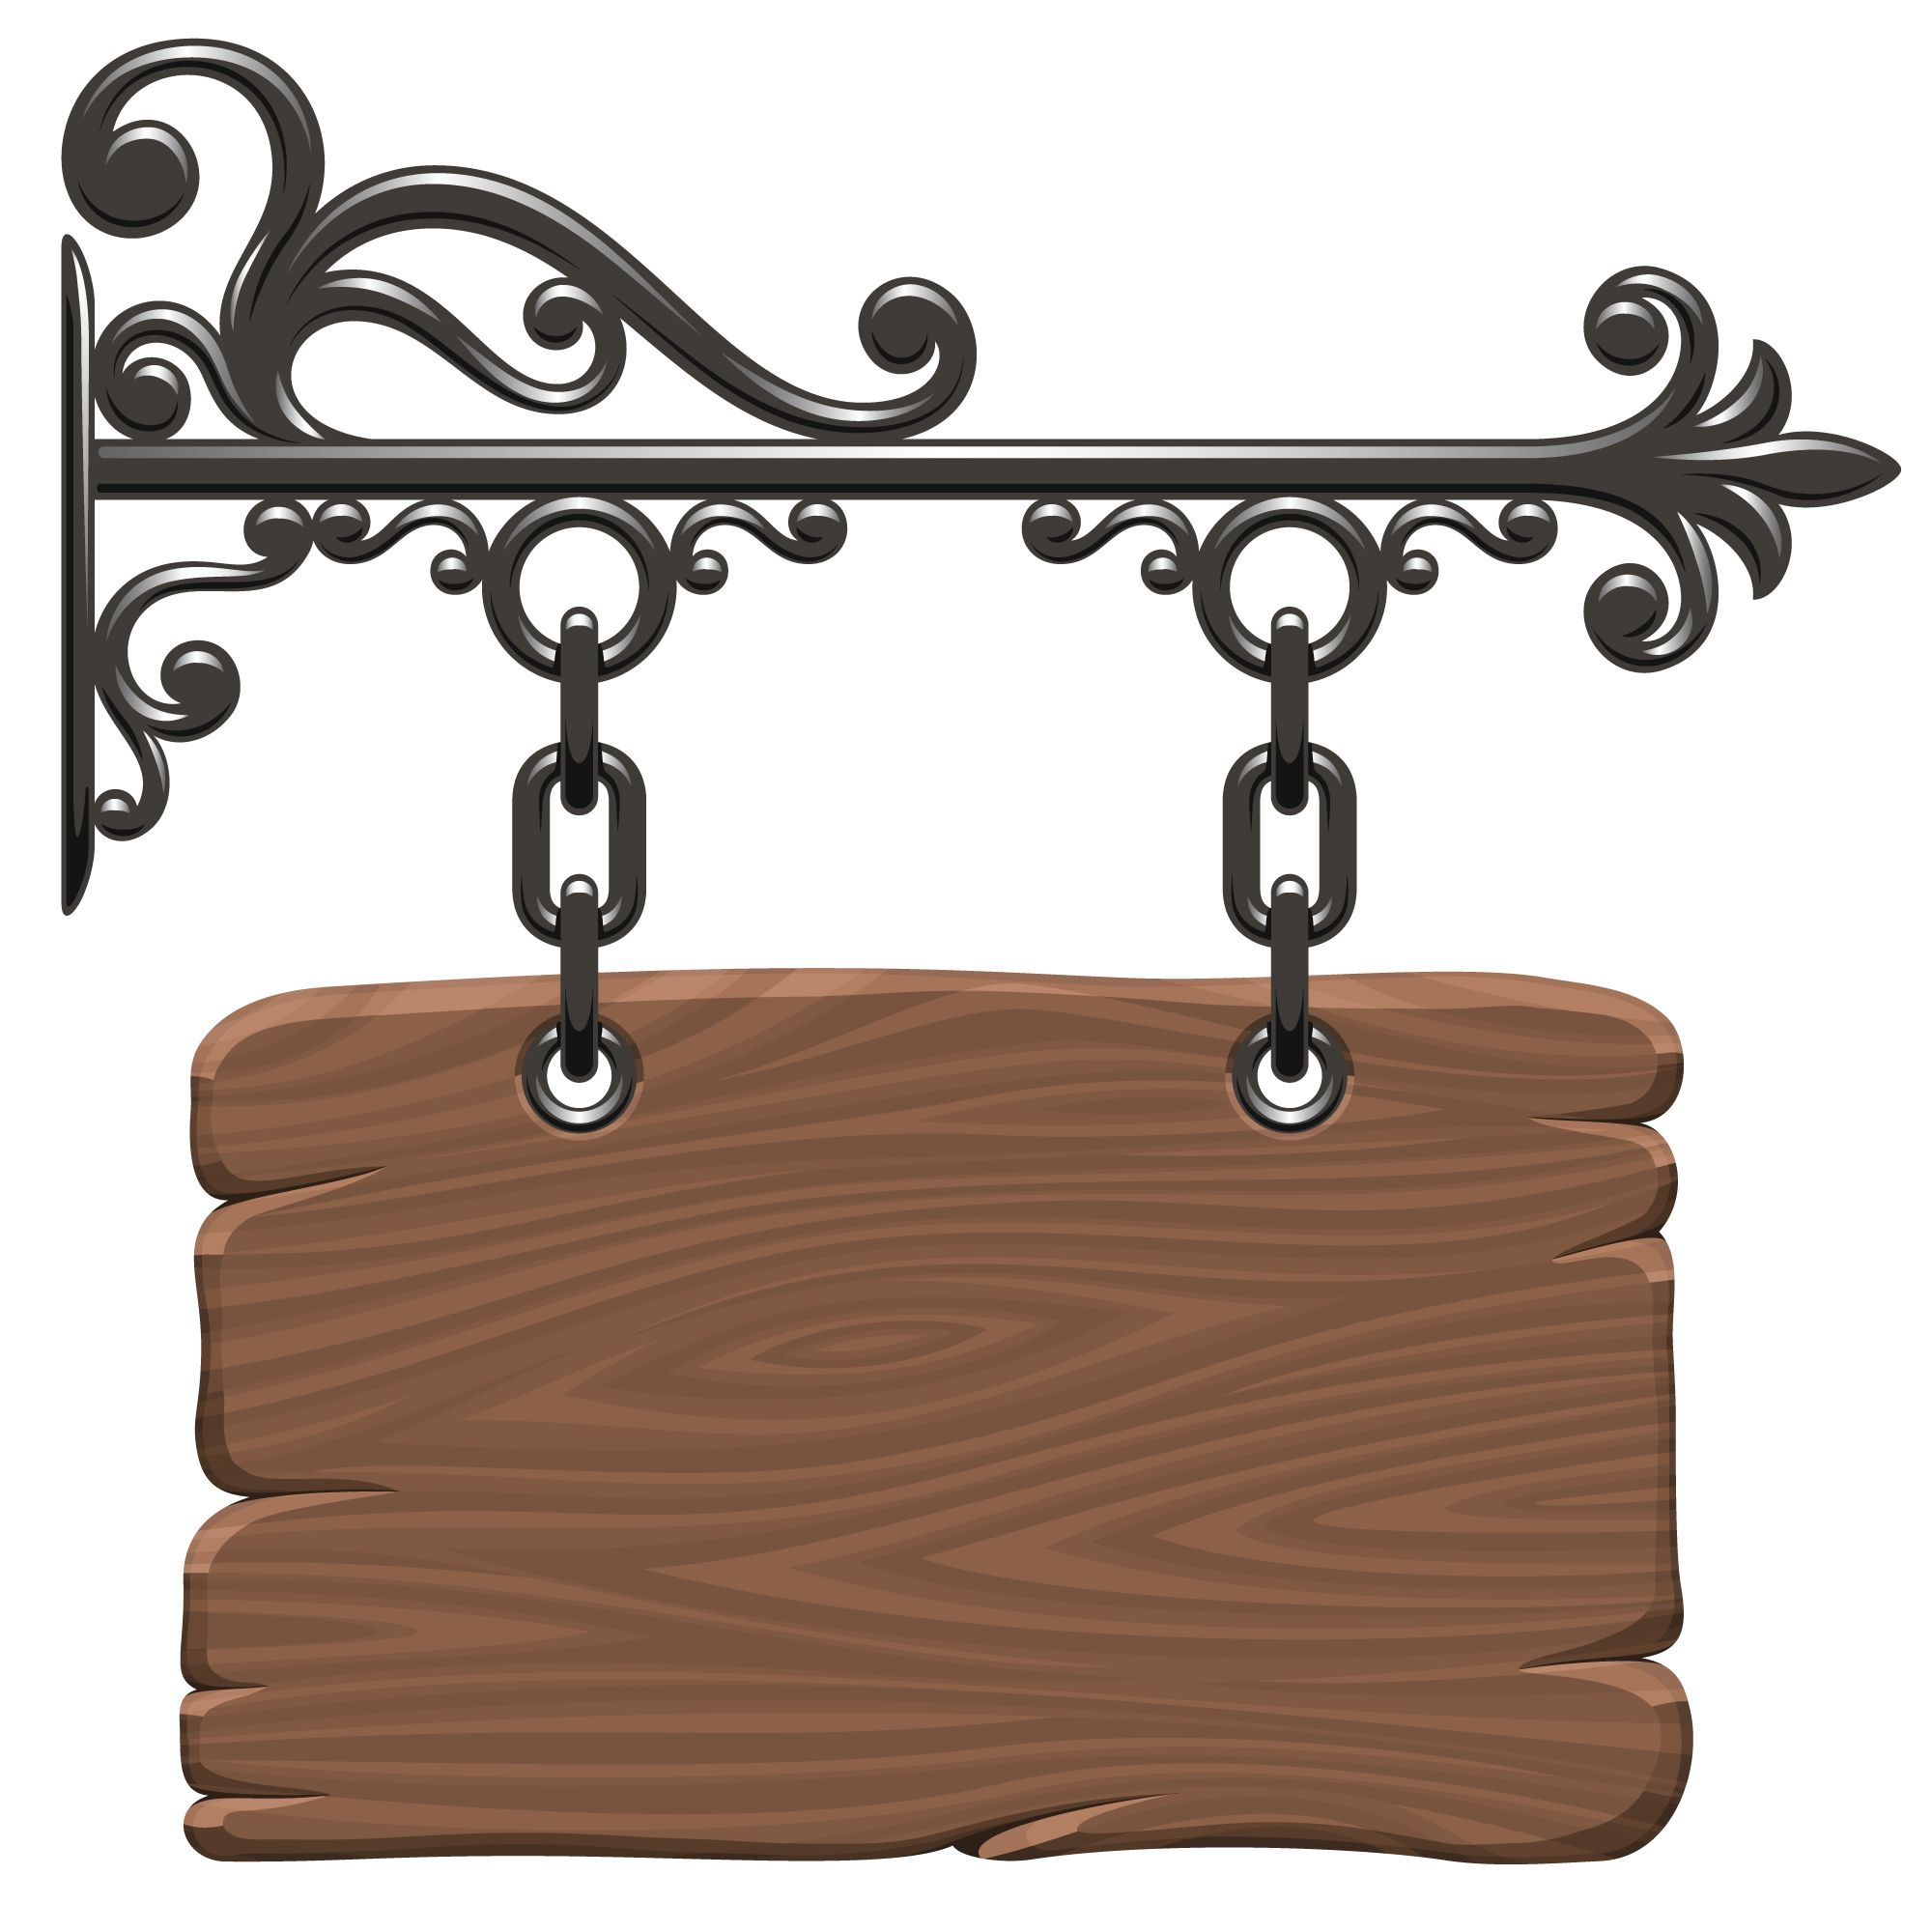 Free Vector Vector Signs And Bulletin Board Material Iron Decor Wrought Iron Decor Iron